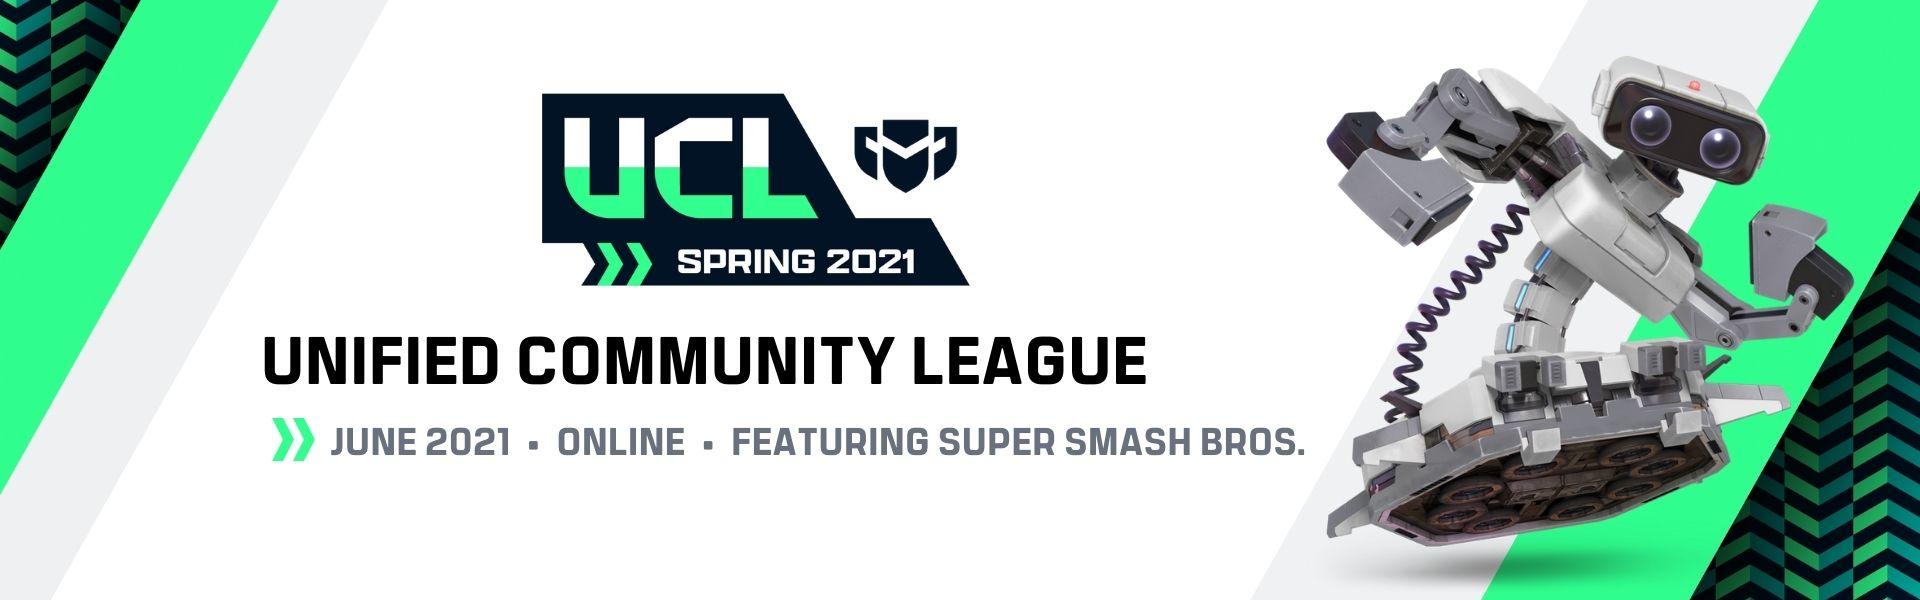 June CEL: Featuring Super Smash Bros. Ultimate